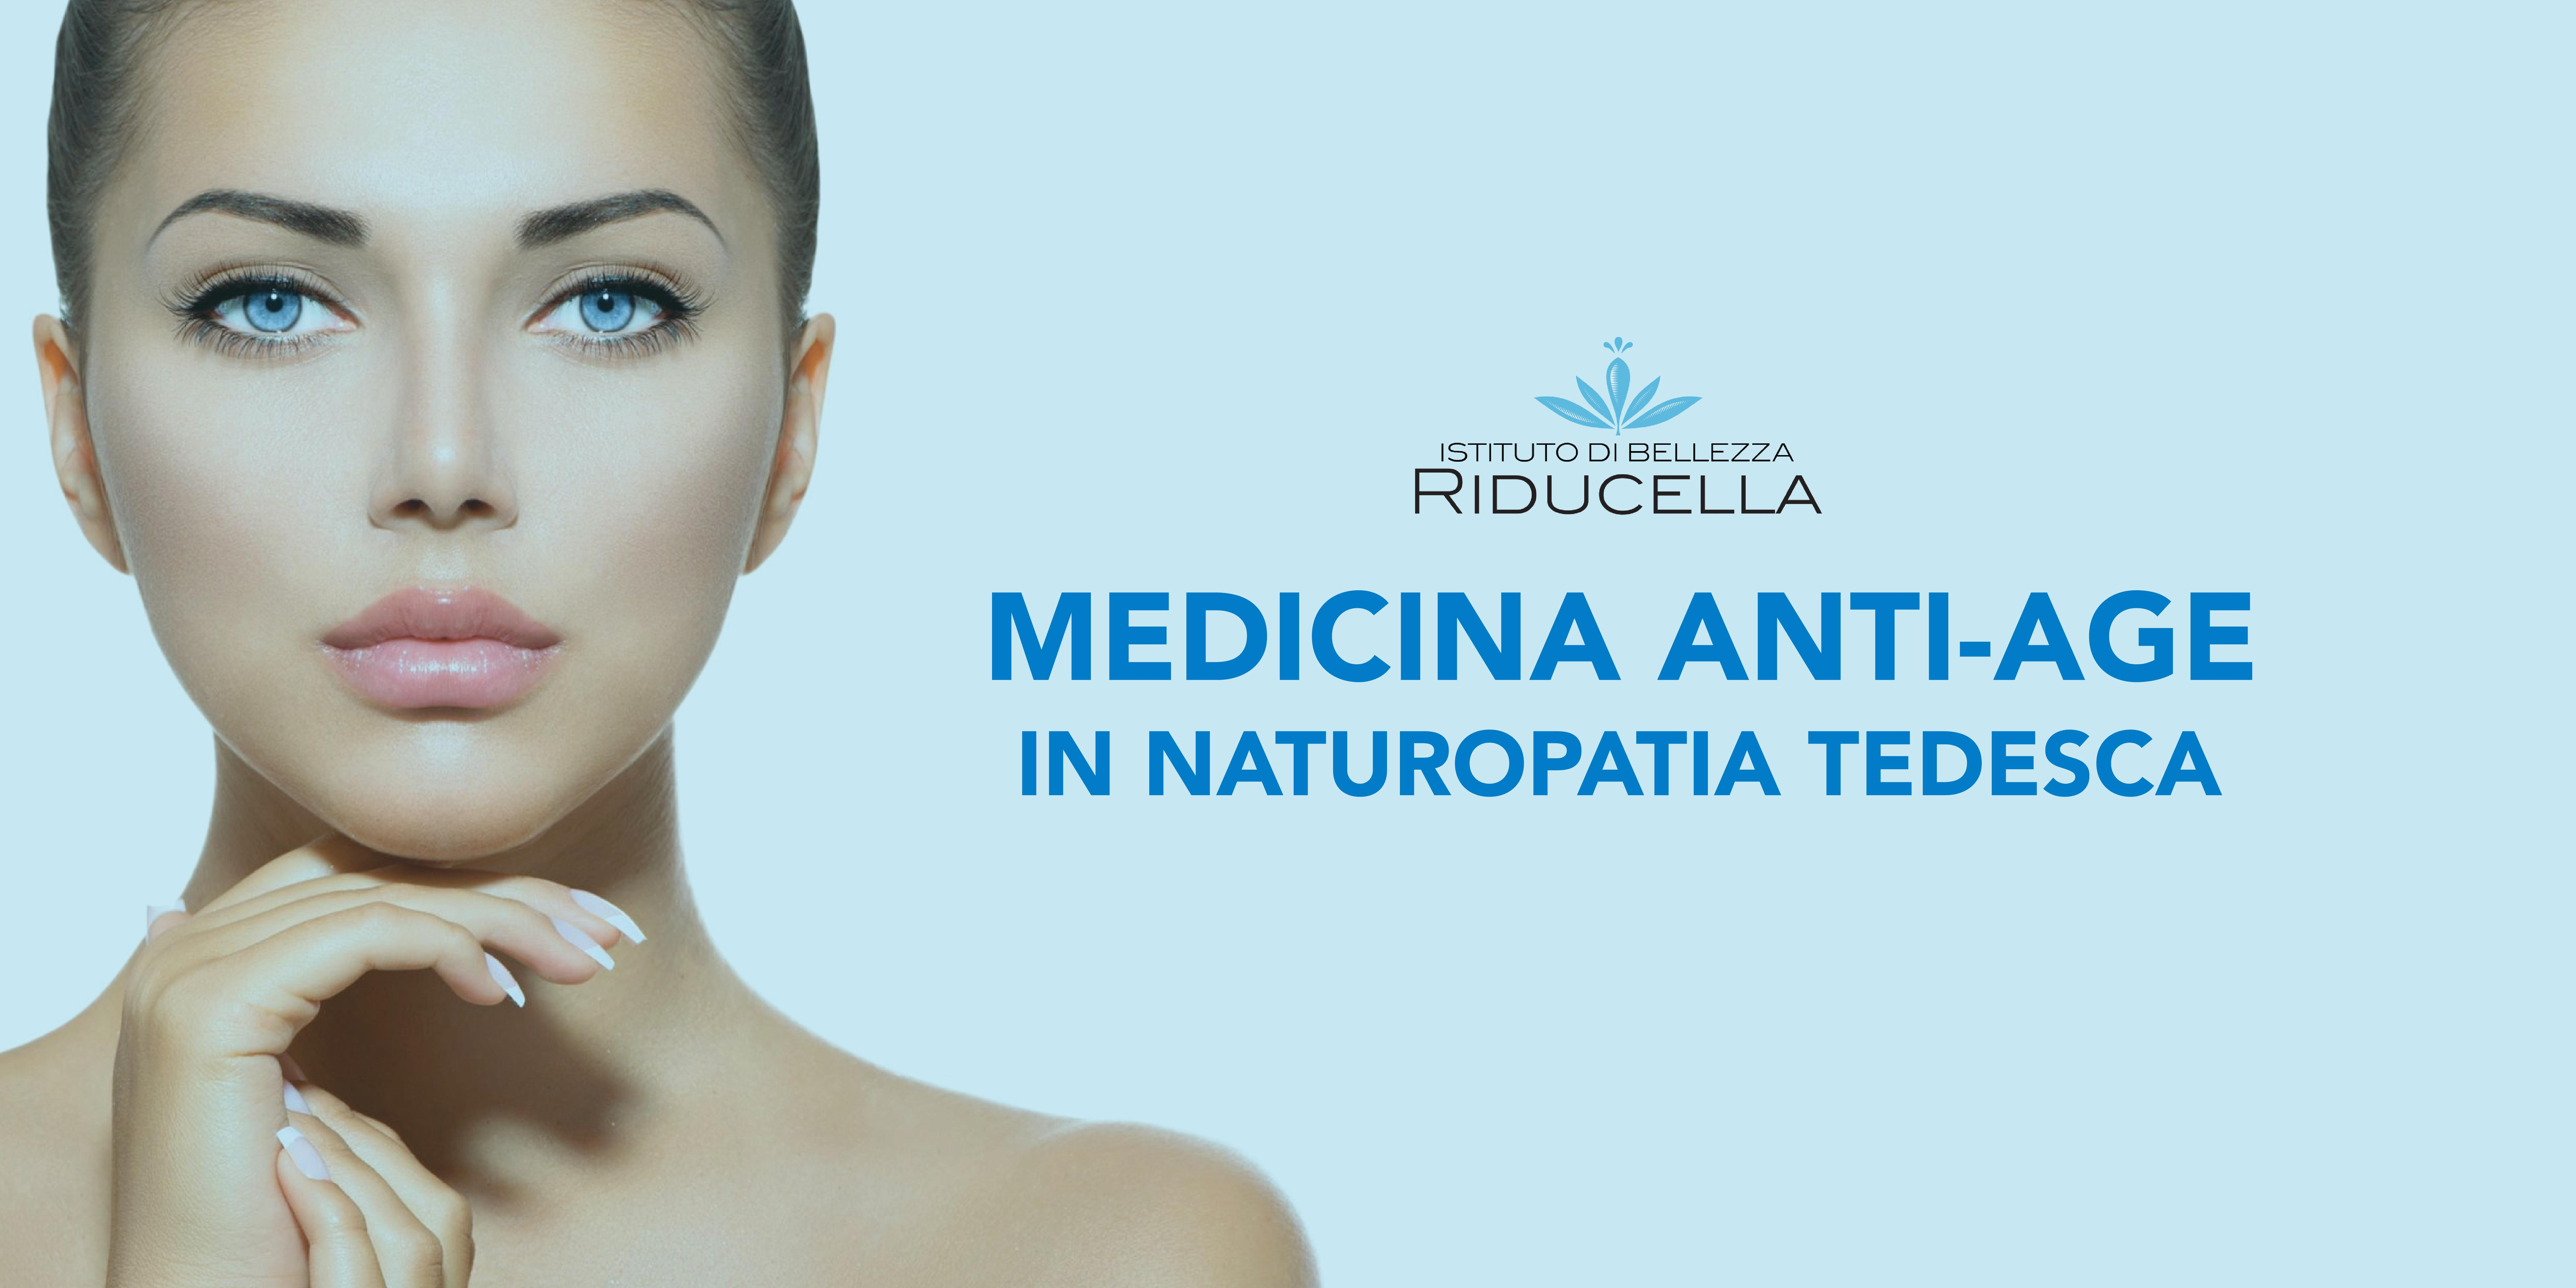 Medicina Anti-Age in Naturopatia Tedesca